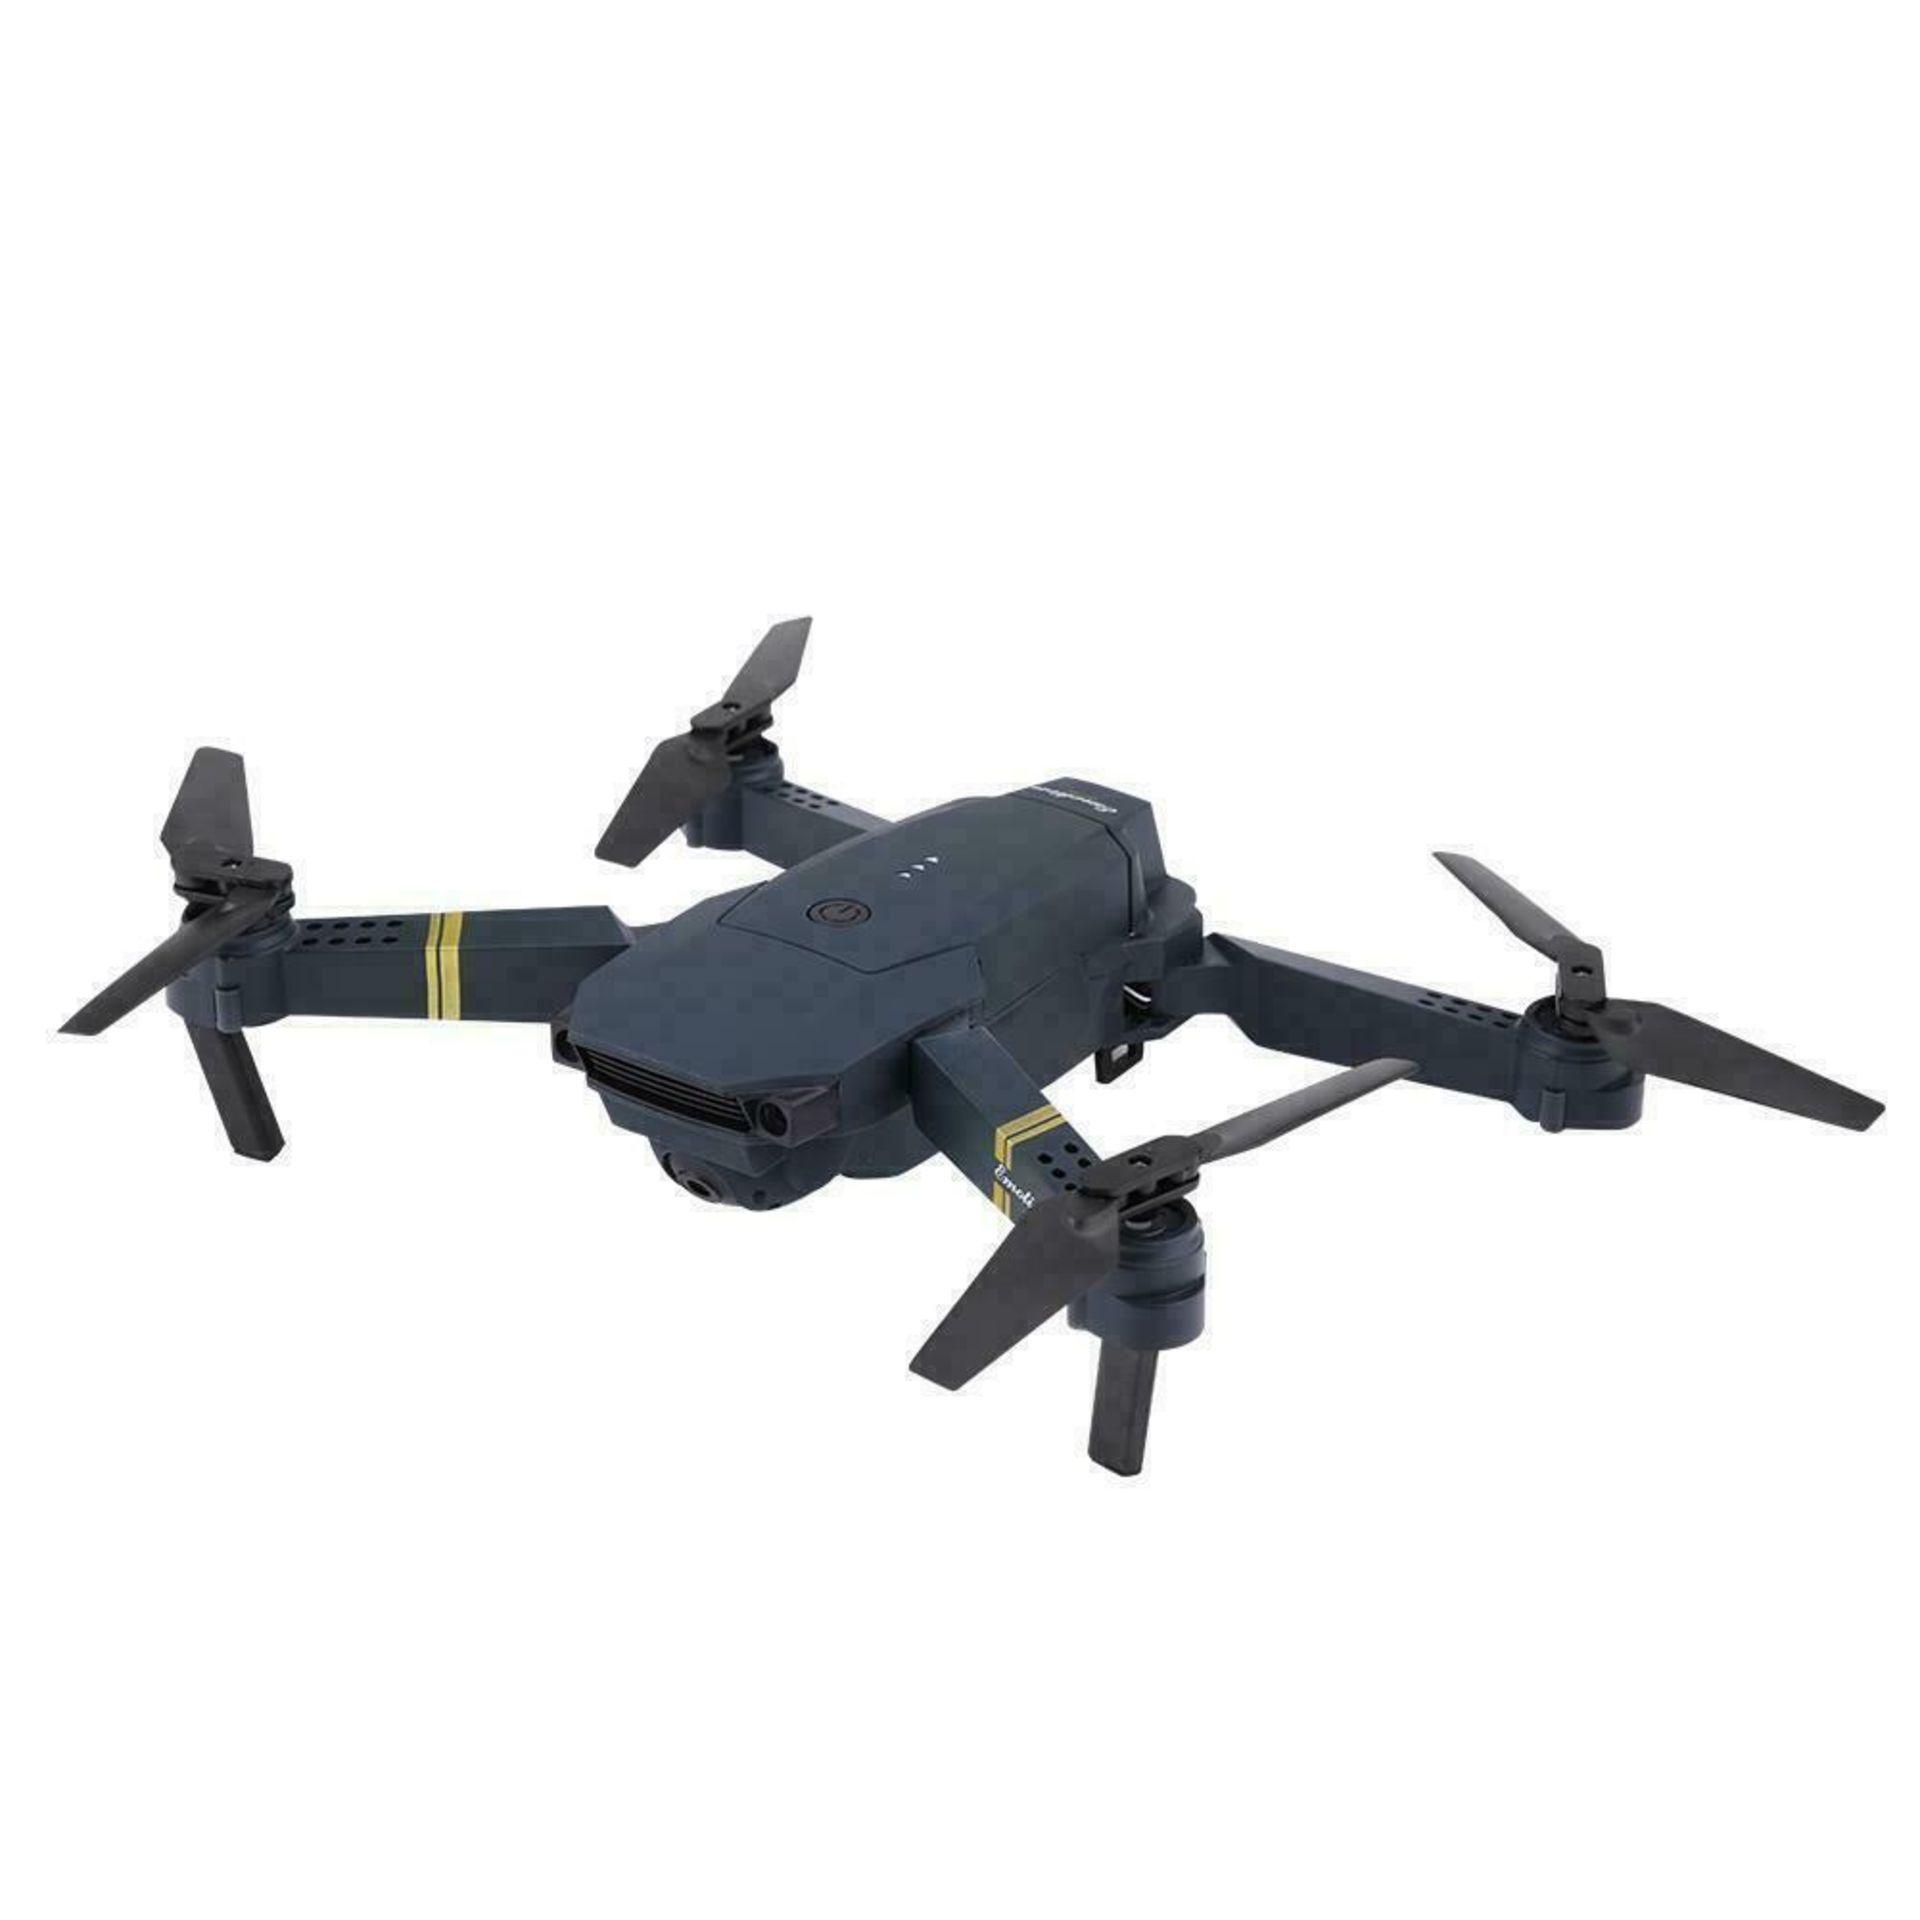 NEW & UNUSED DRONE X PRO WIFI FPV 1080P HD CAMERA FOLDABLE RC QUADCOPTER + BAG *PLUS VAT*